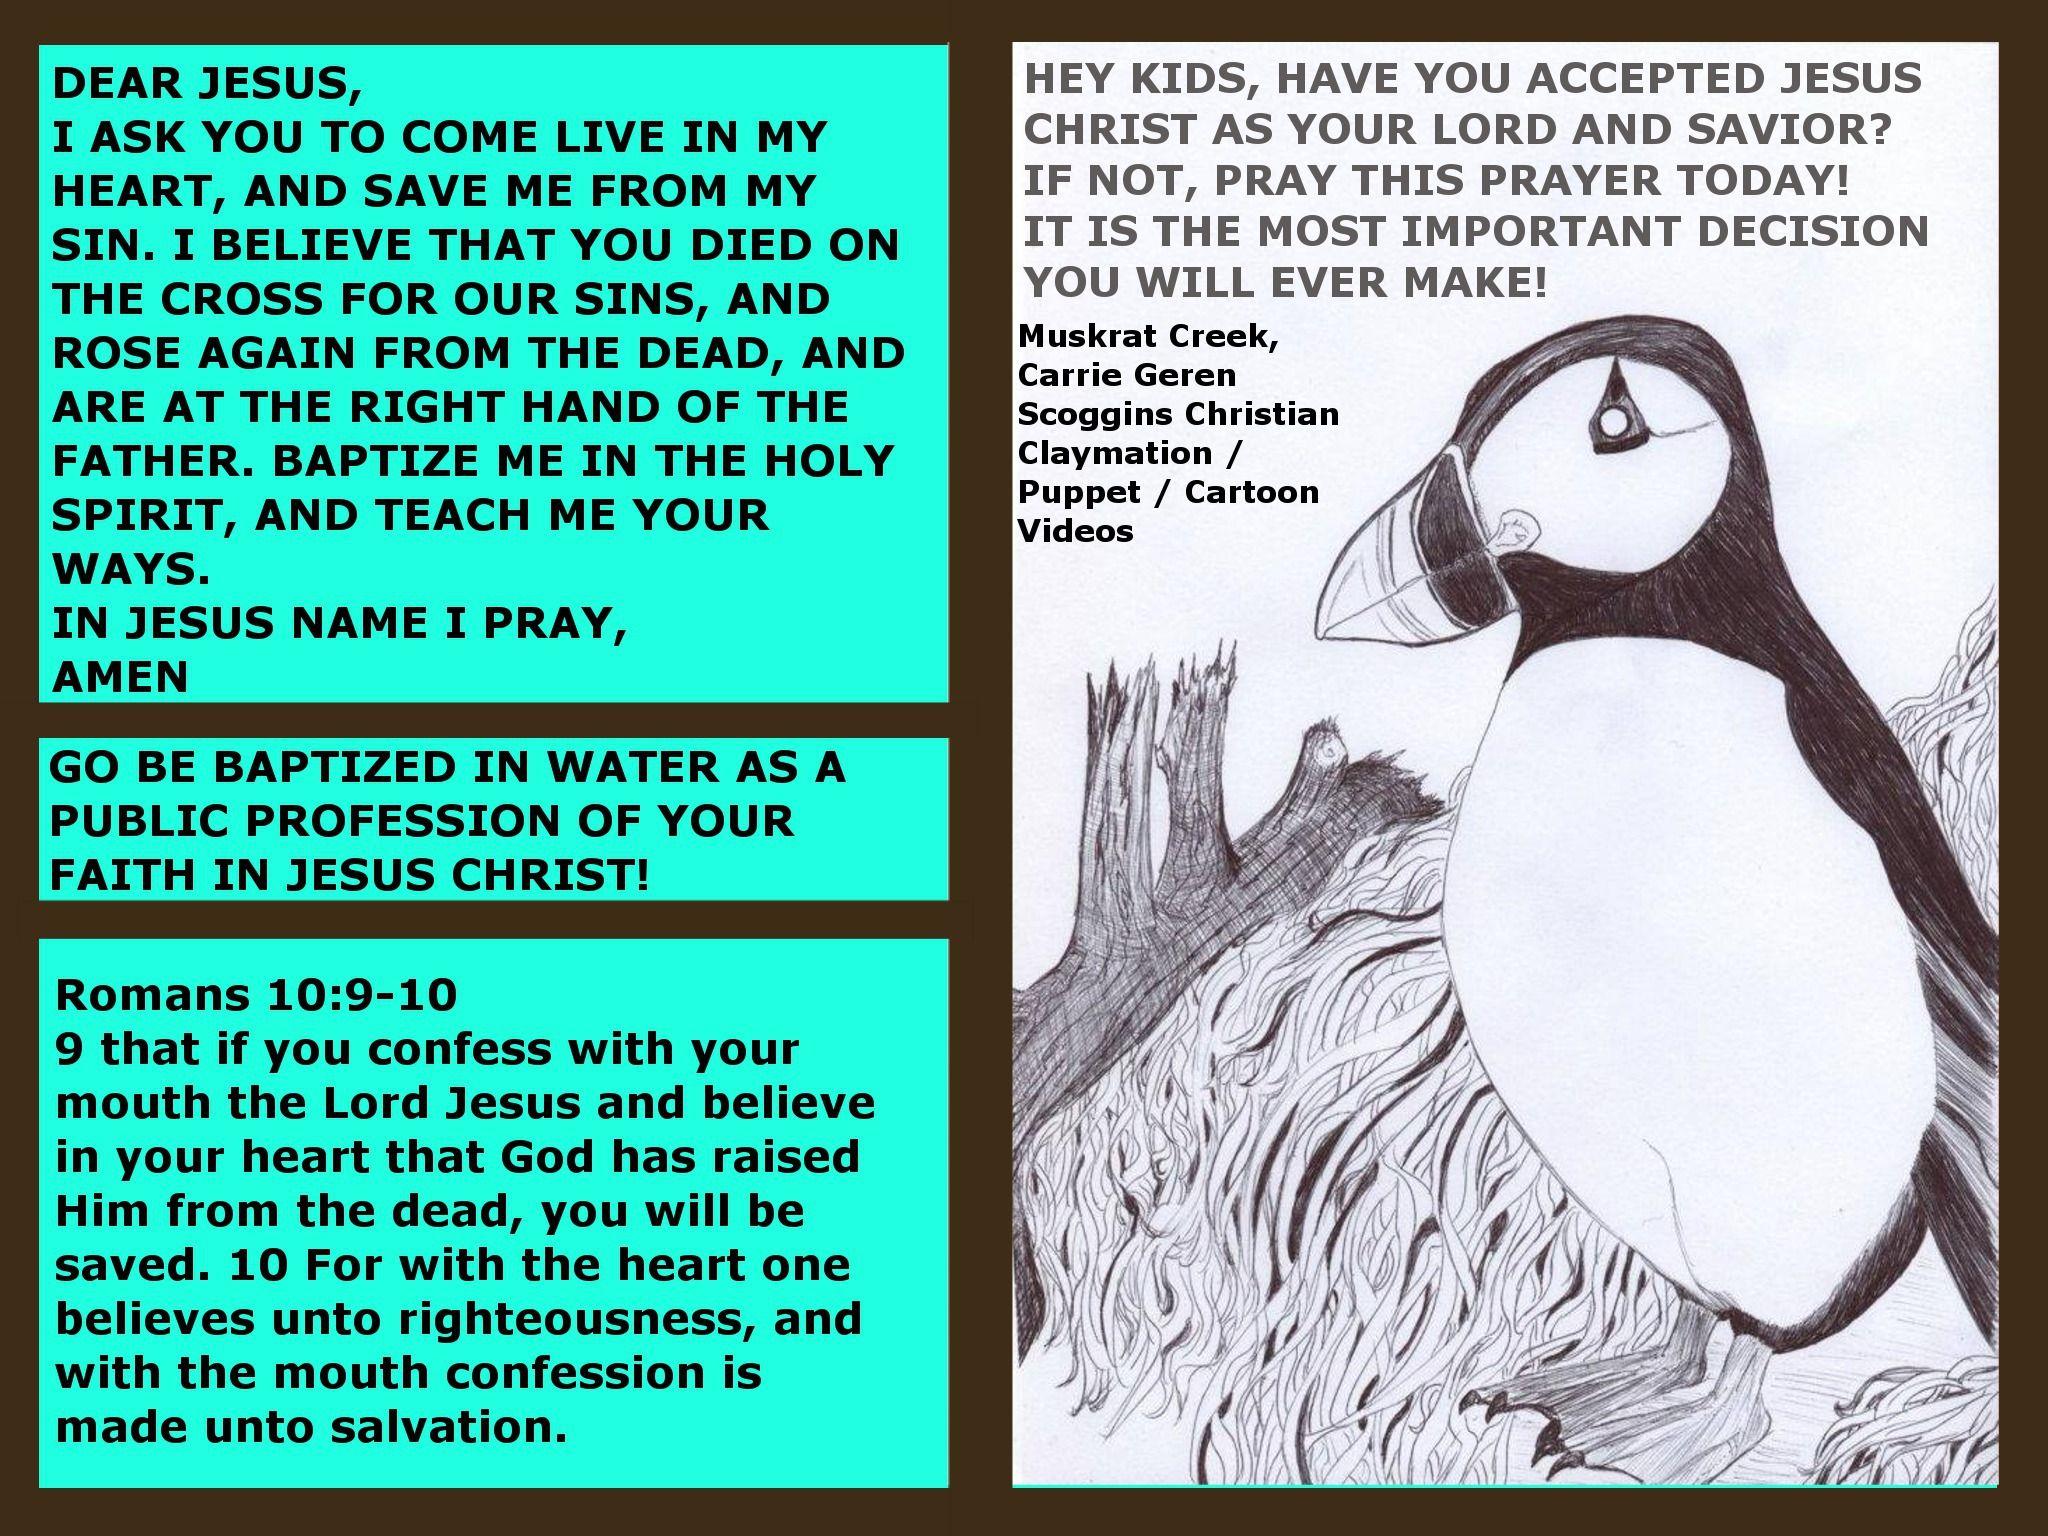 PRAYER OF SALVATION FOR KIDS, FROM MUSKRAT CREEK, CARRIE